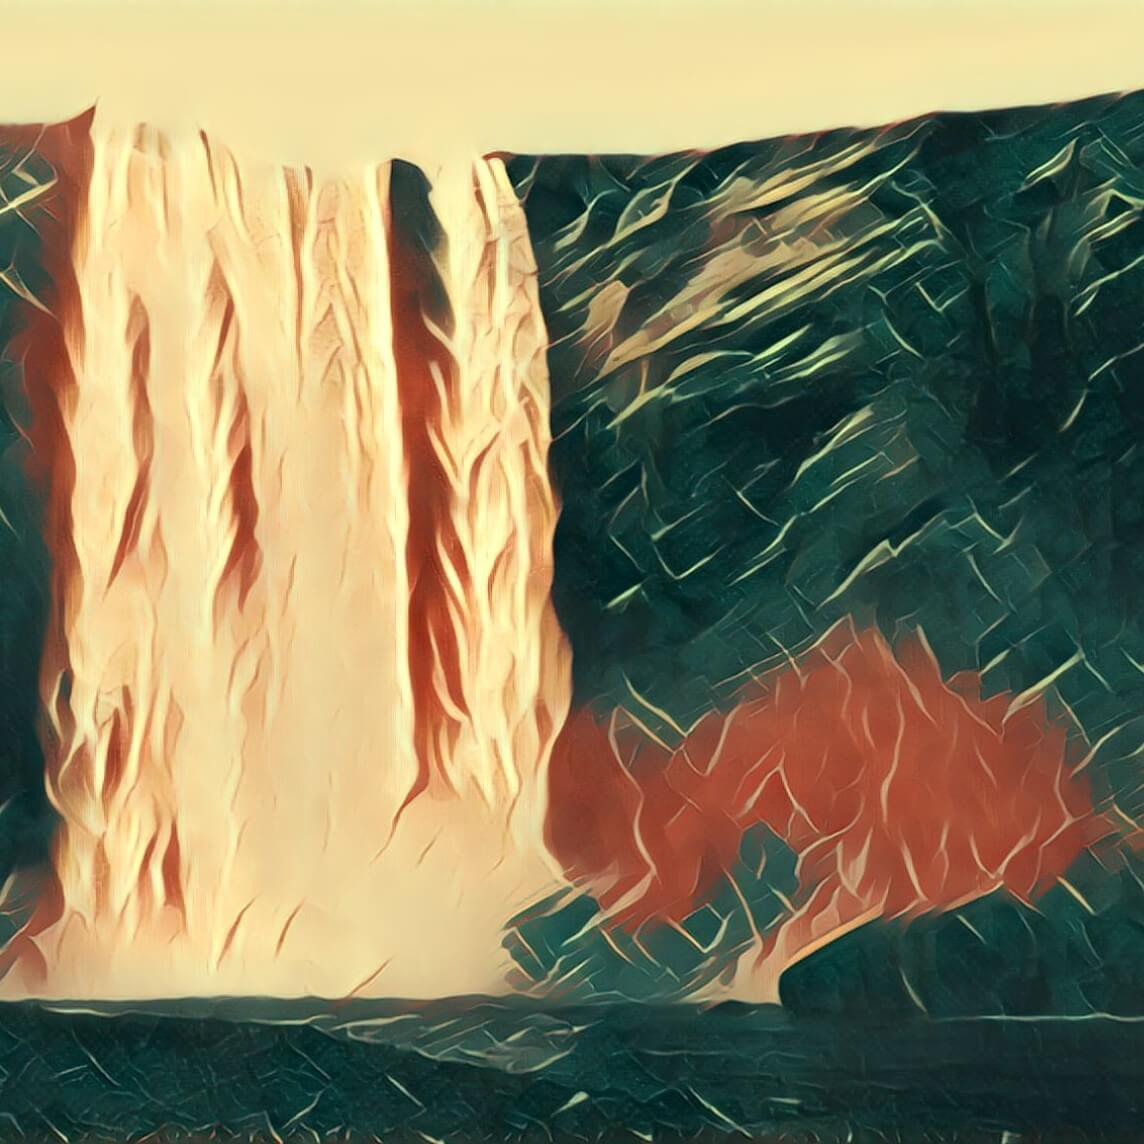 Wasserfall - Traum-Deutung